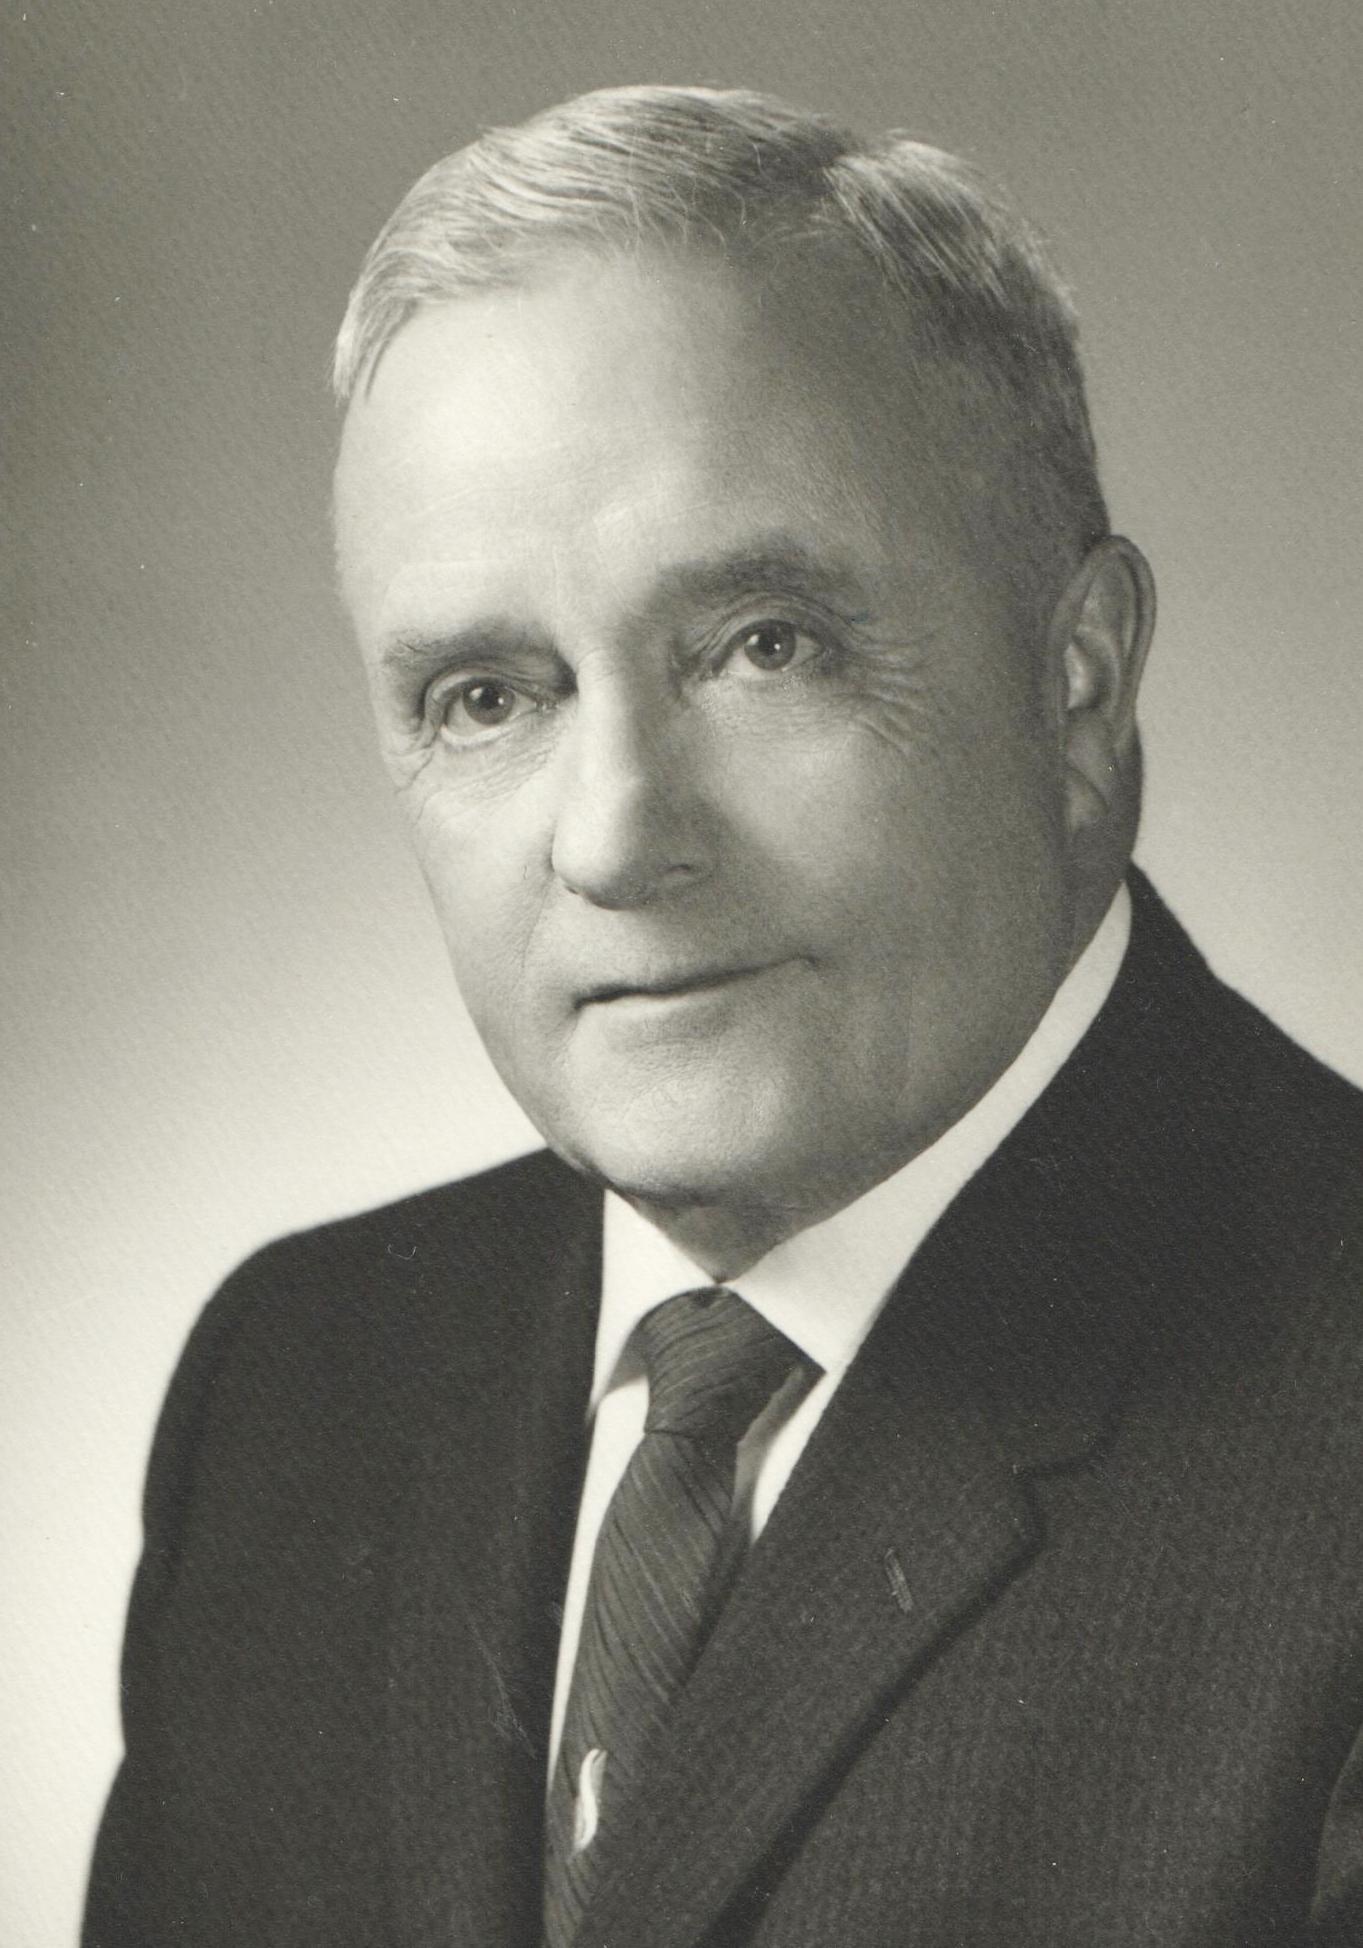 1957 August A. Forsman